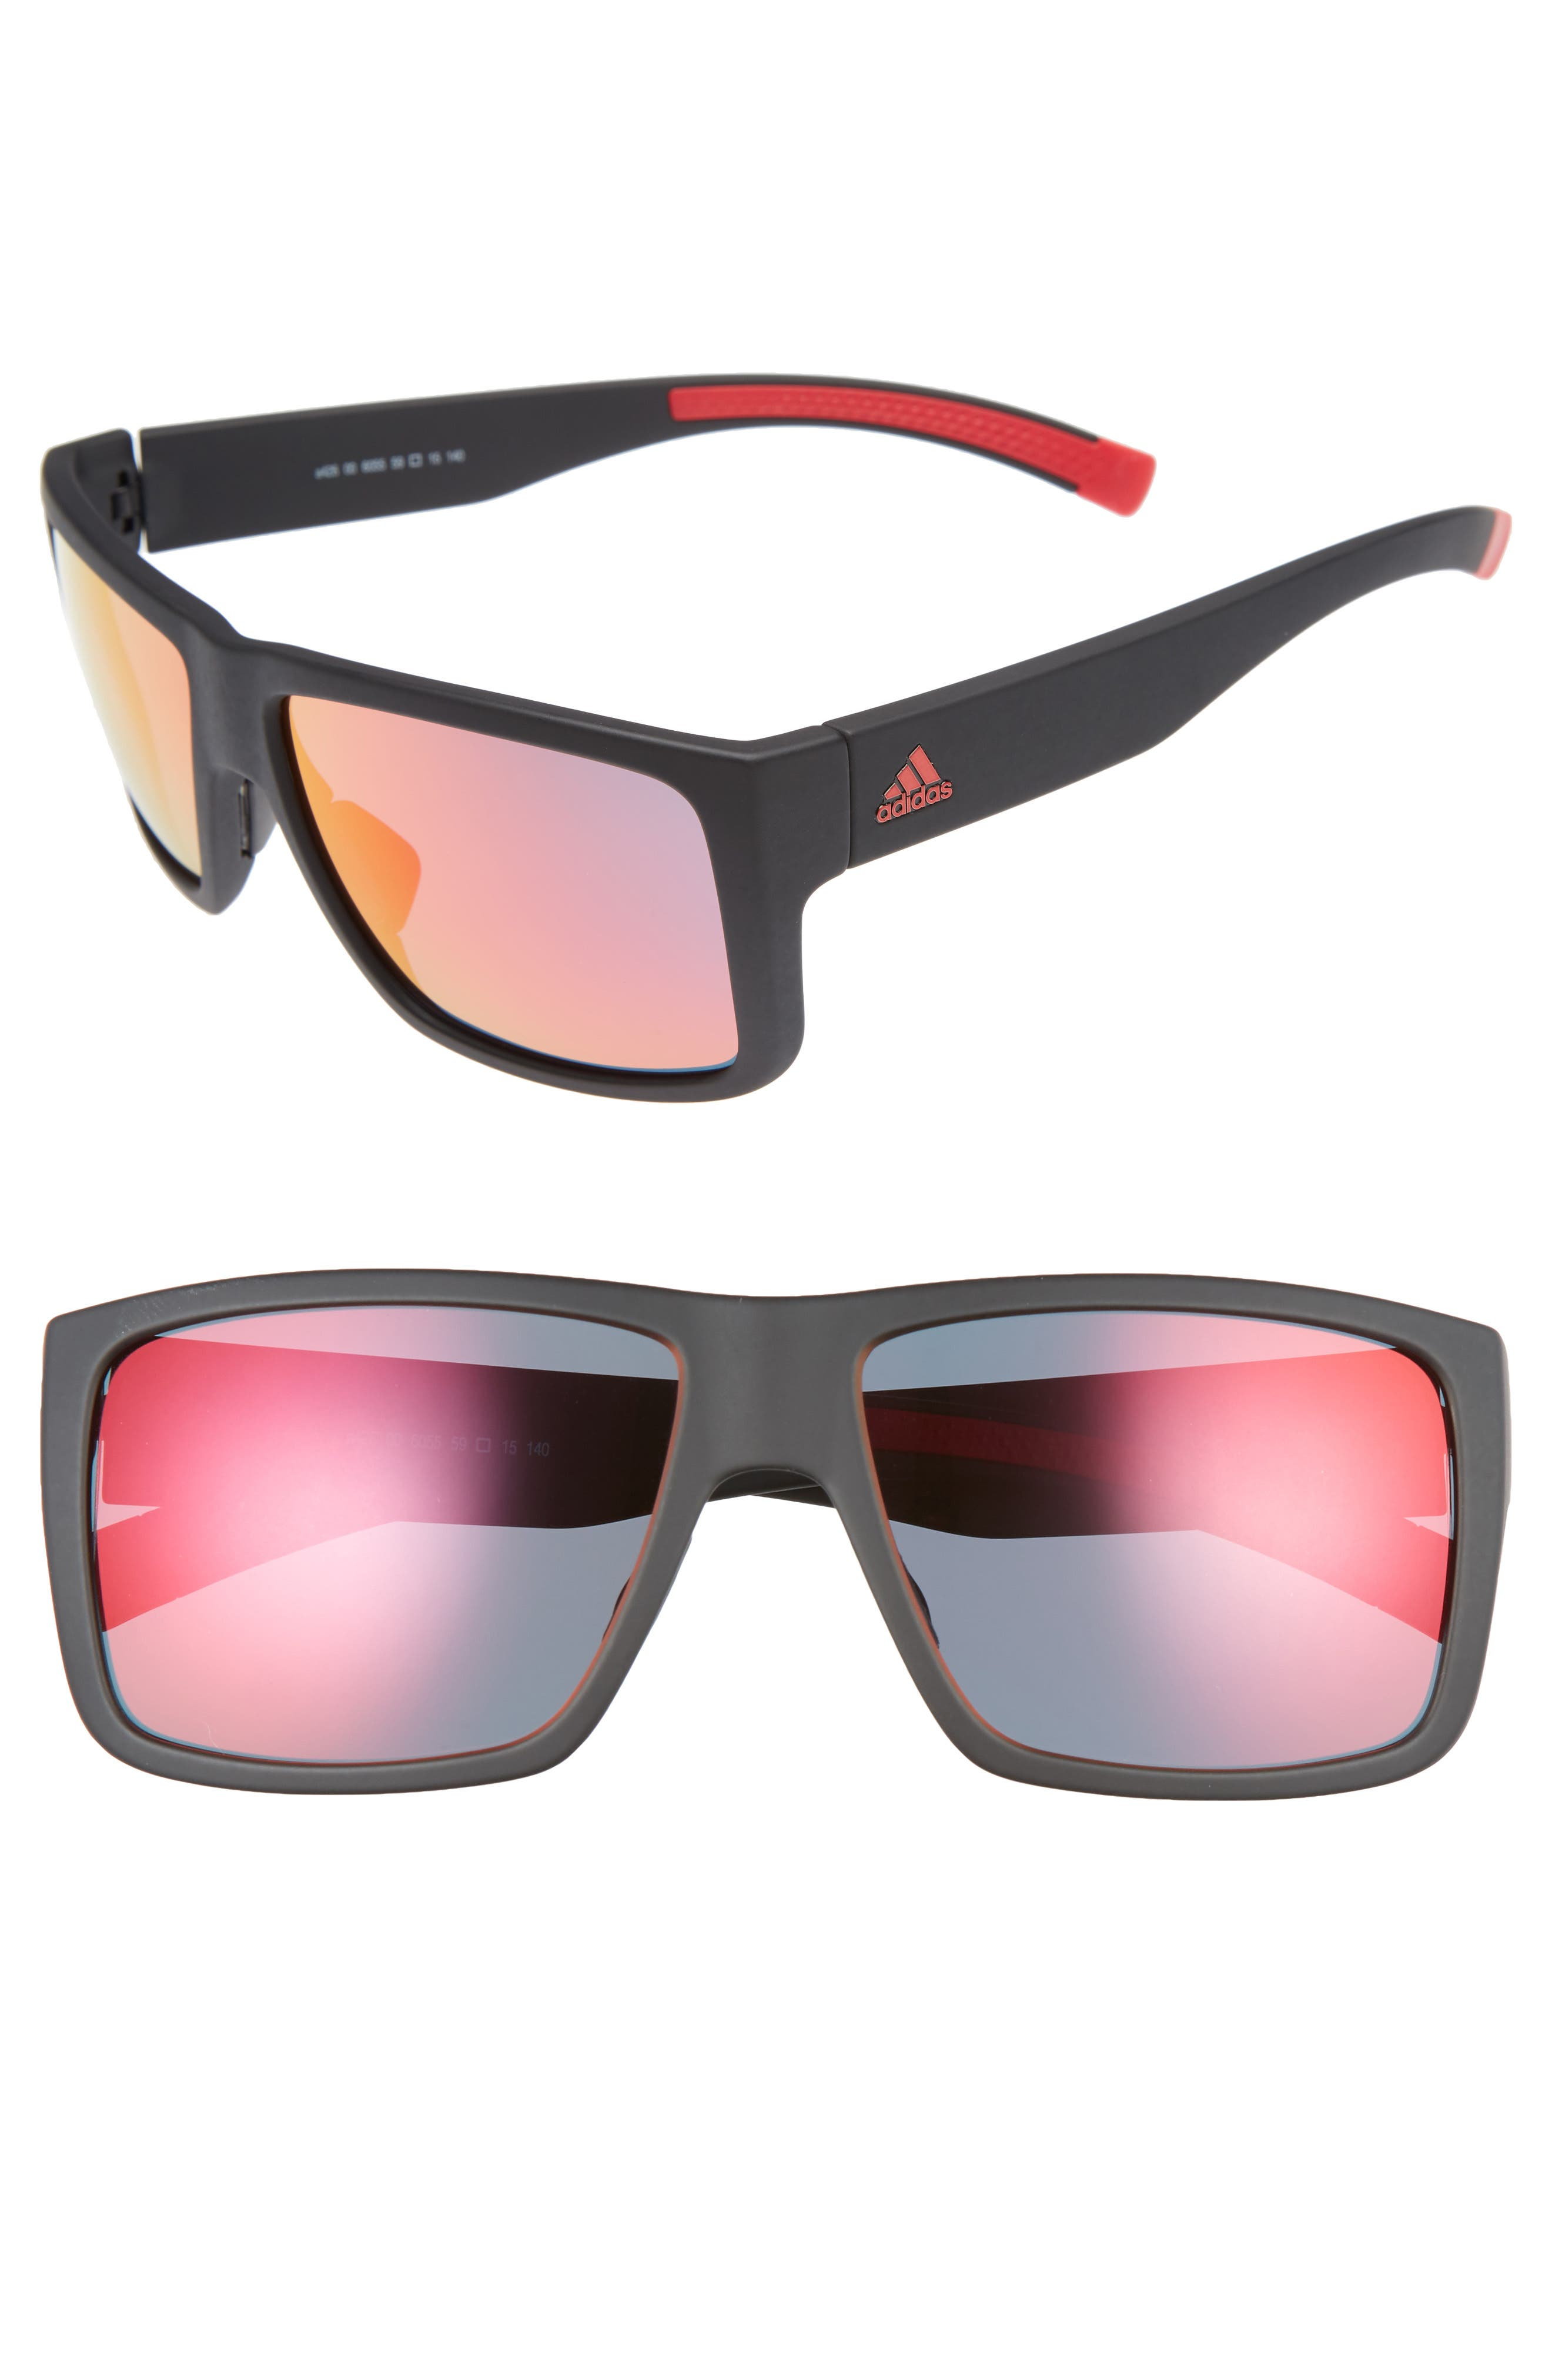 Matic 59mm Sunglasses,                             Alternate thumbnail 2, color,                             BLACK MATTE/ RED MIRROR